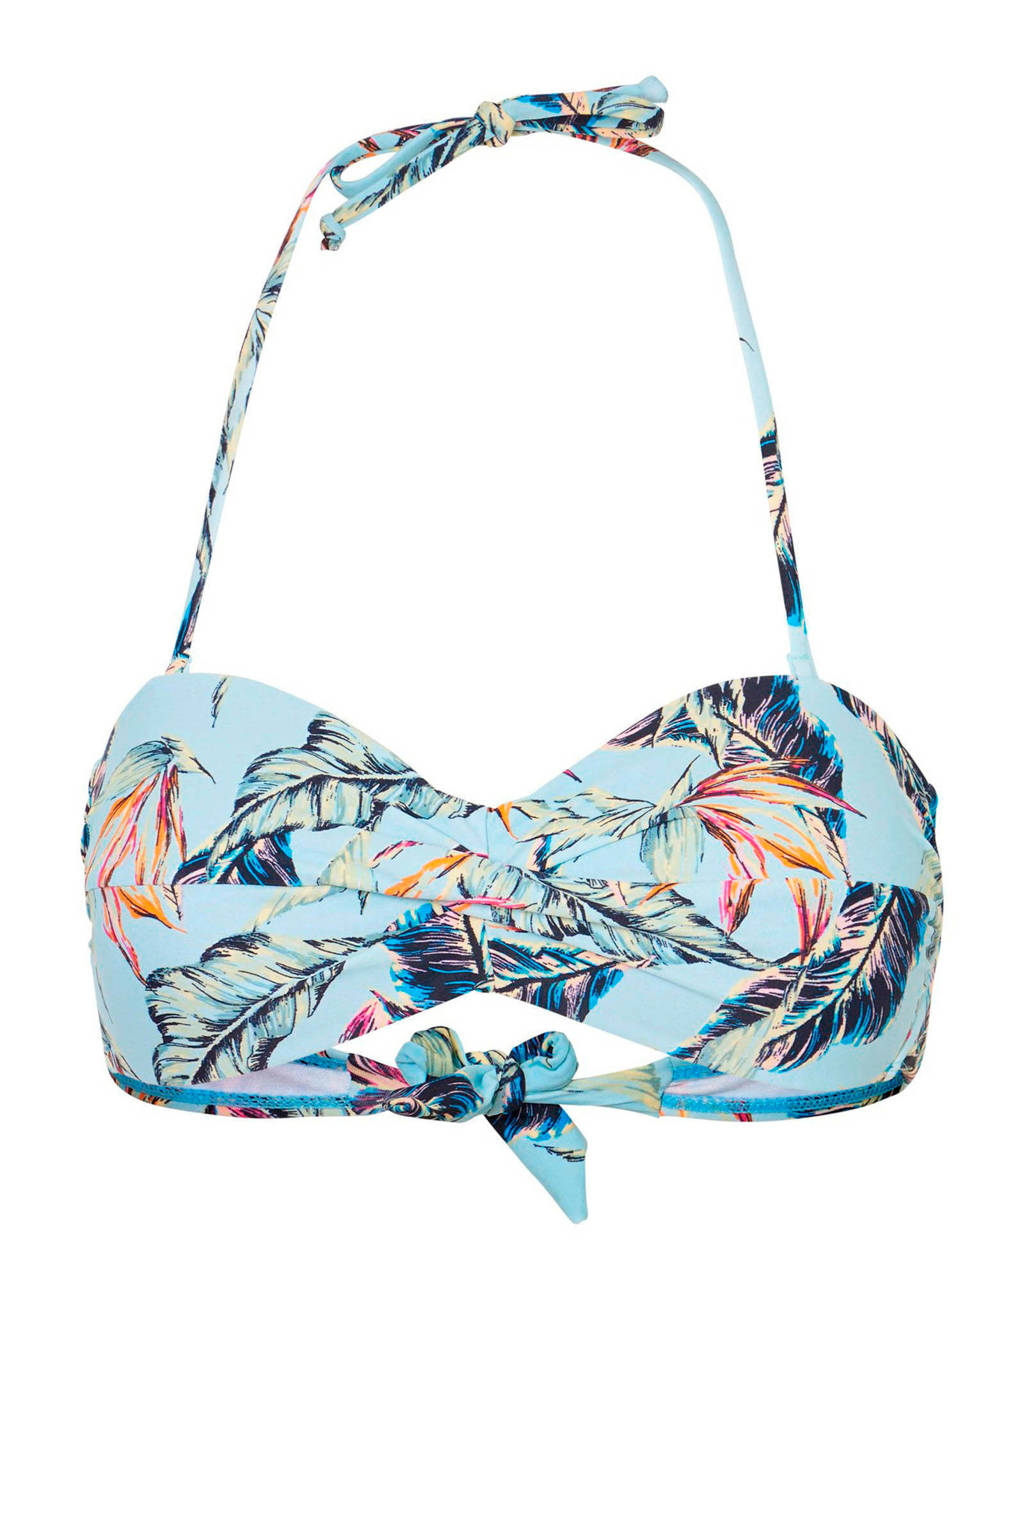 VERO MODA bandeau bikinitop in een all over print blauw, Lichtblauw/groen/oranje